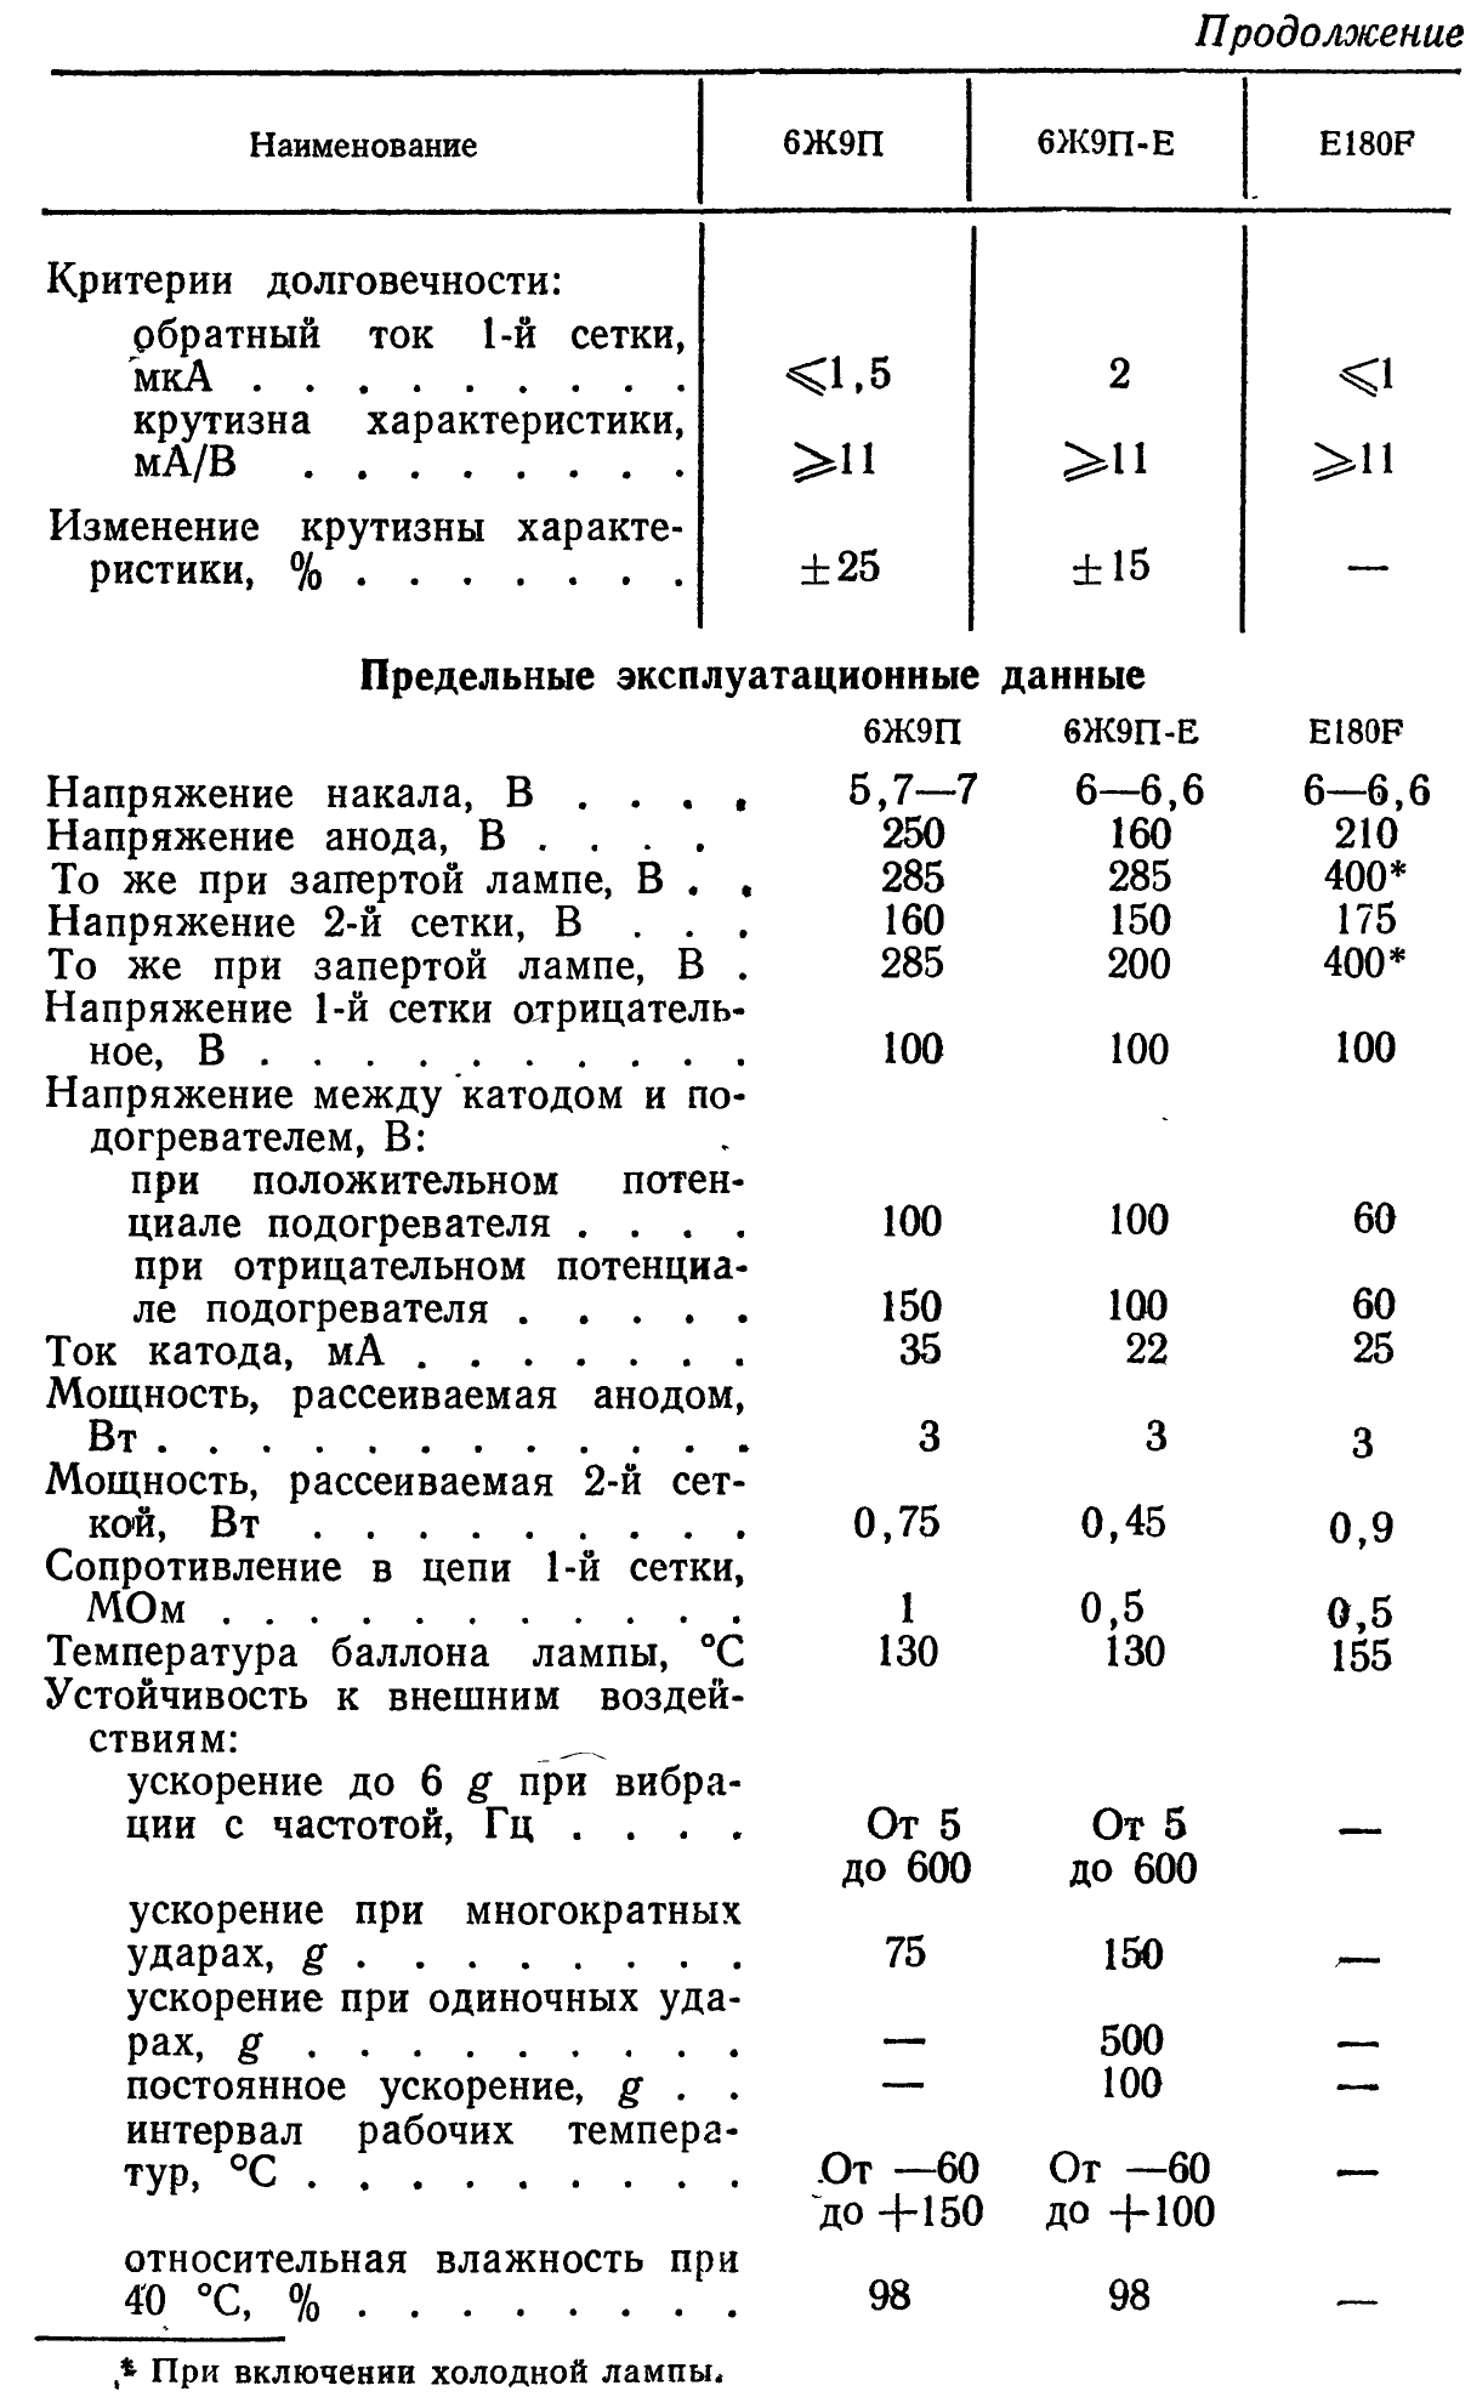 Параметры радиоламп 6Ж9П, 6Ж9П-Е, E180F